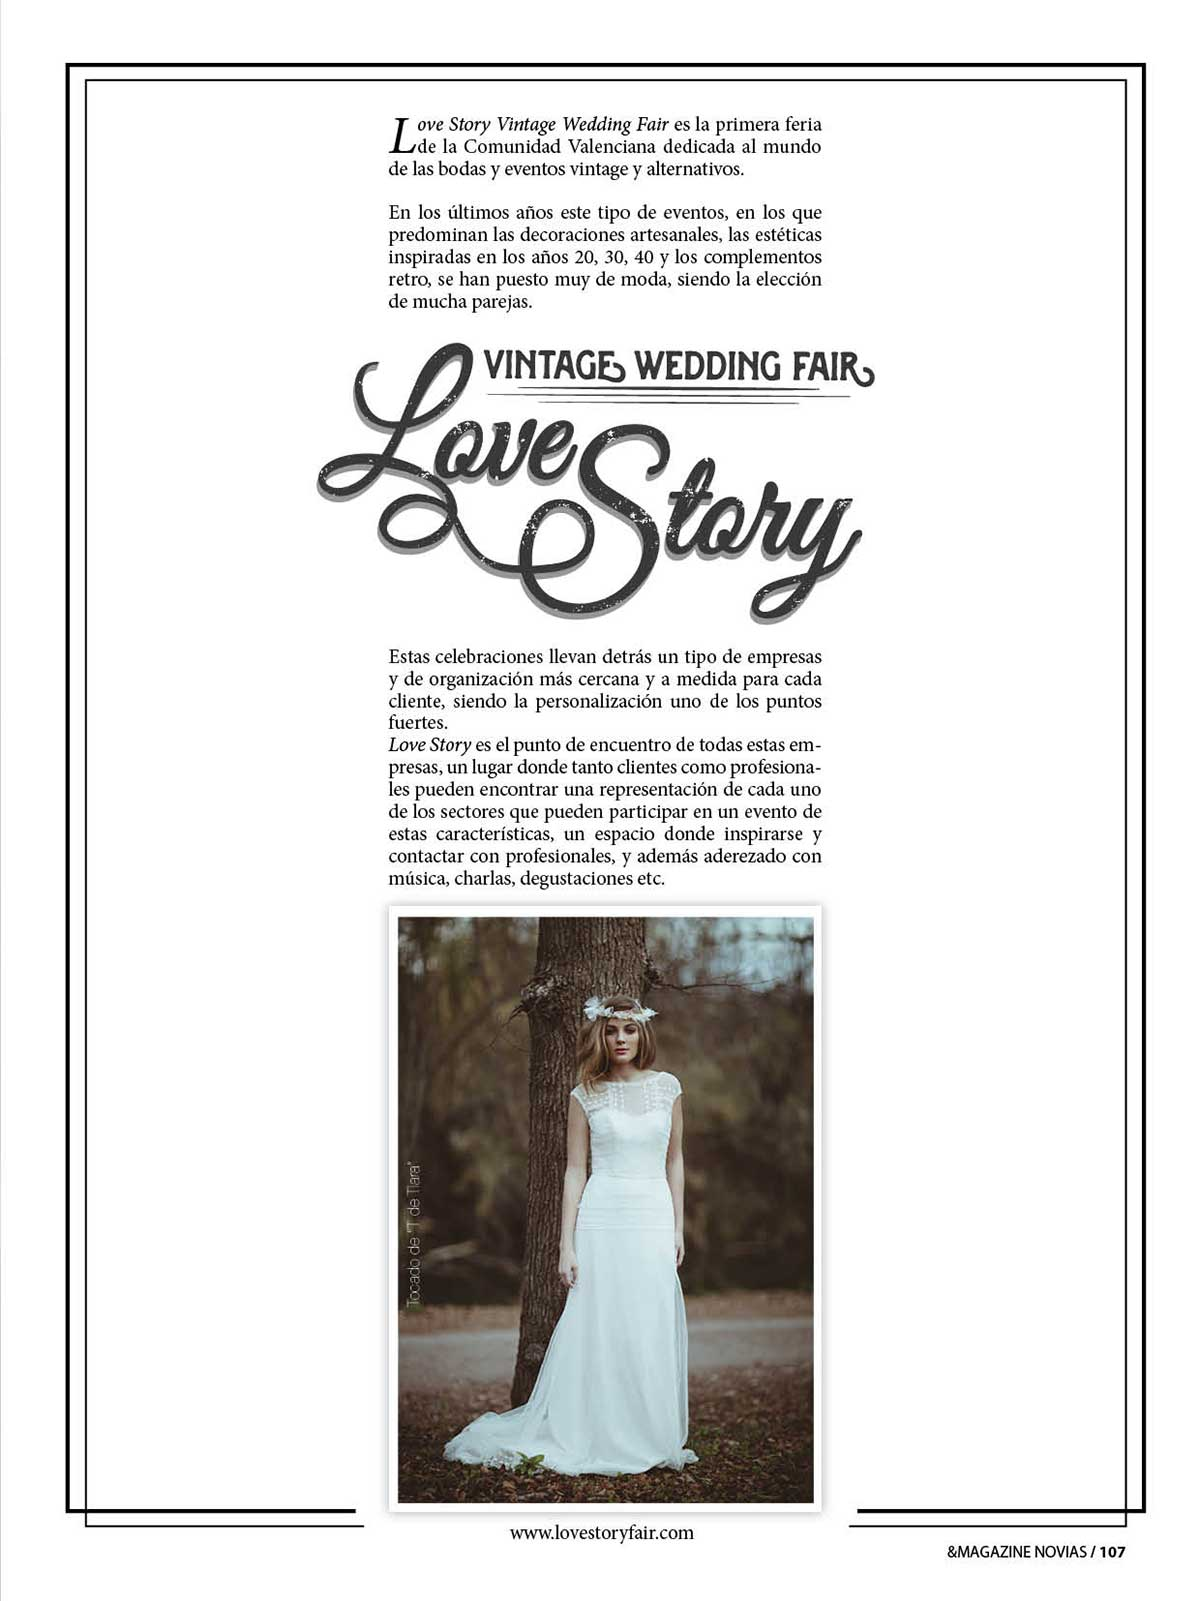 """Love Story Vintage Wedding Fair"" en And Magazine Novias."